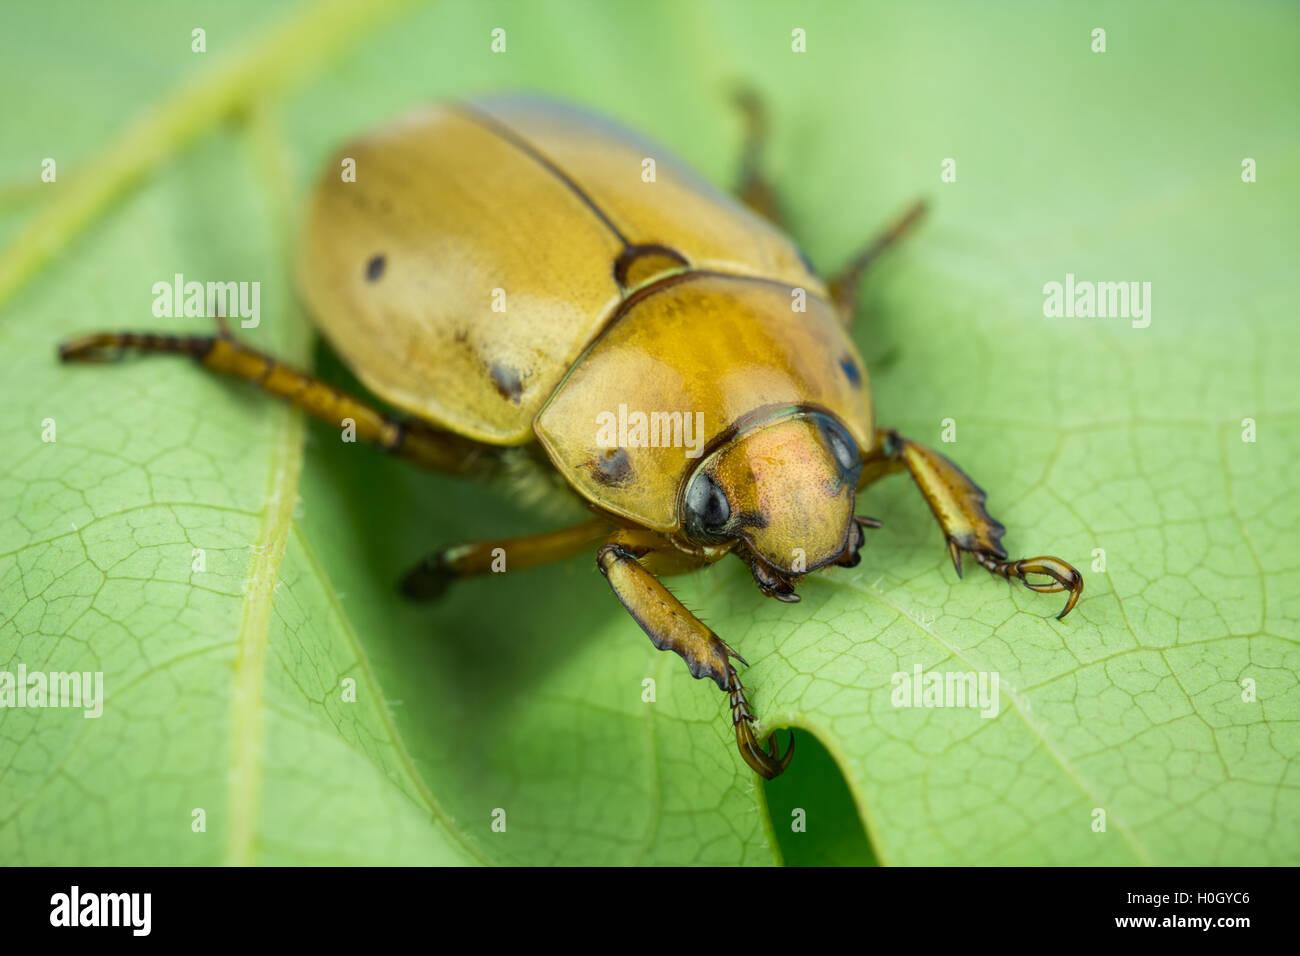 Macro of injured grapevine scarab beetle on leaf. Tarsal claws on forelegs. - Stock Image